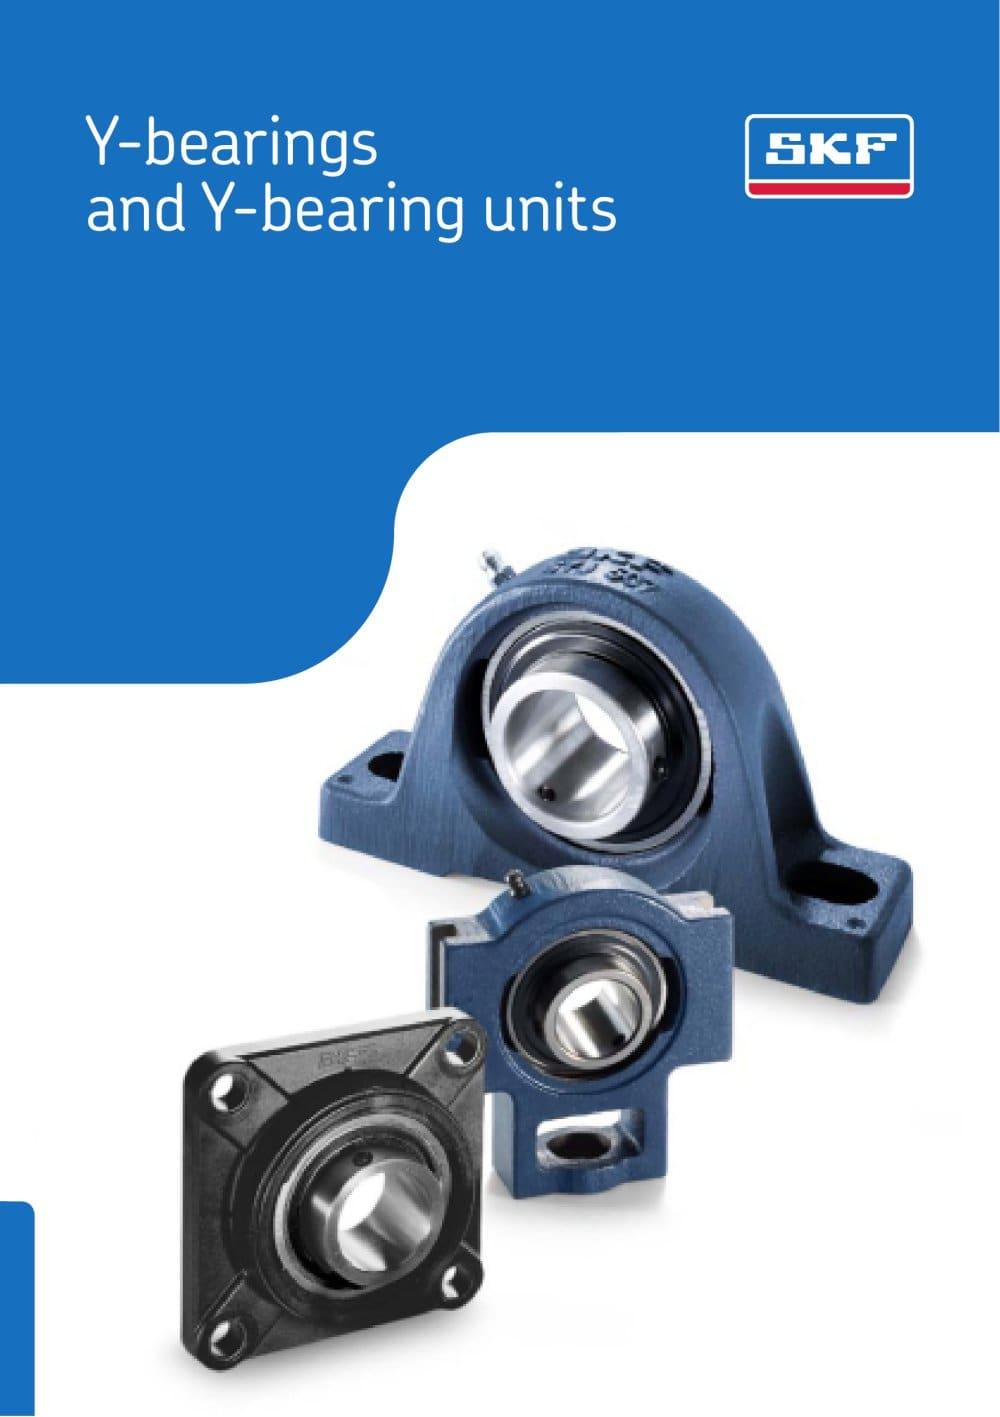 Skf Taper Roller Bearing Catalogue Pdf